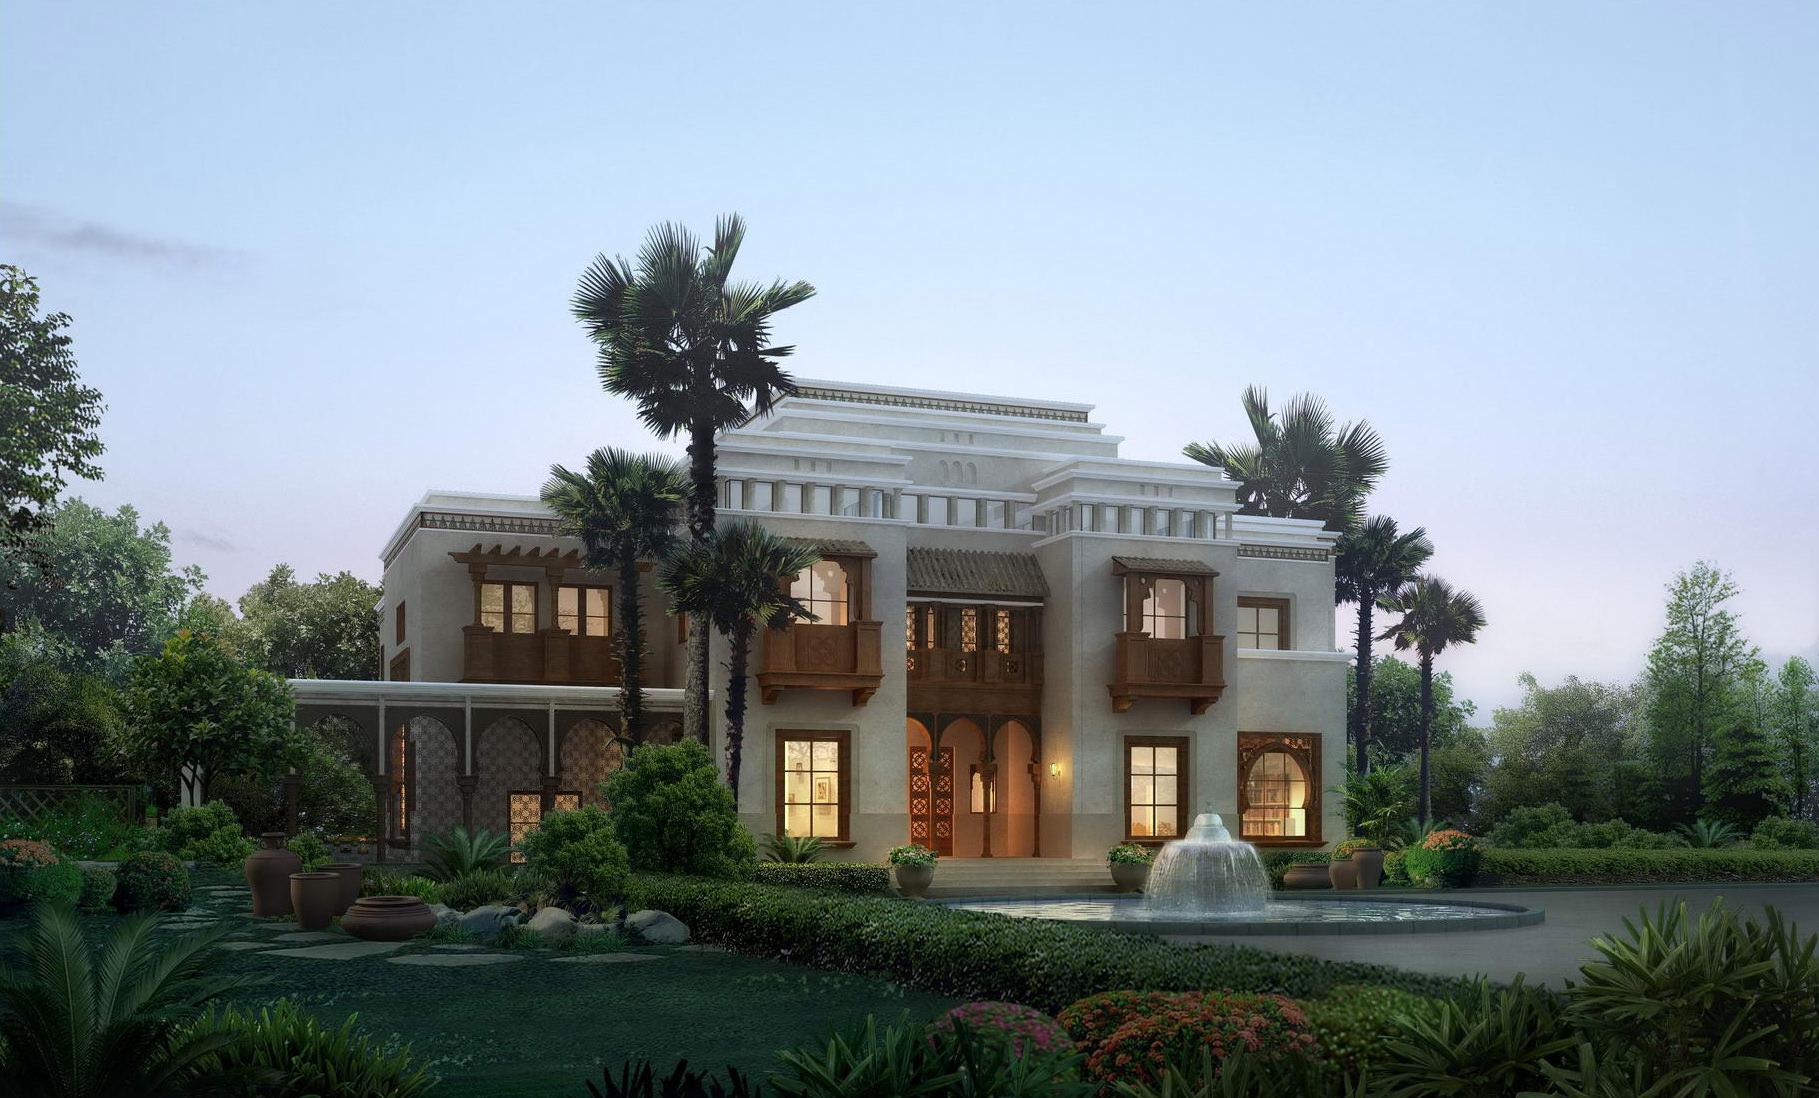 Luxury villa with palm tree 3d model max 1